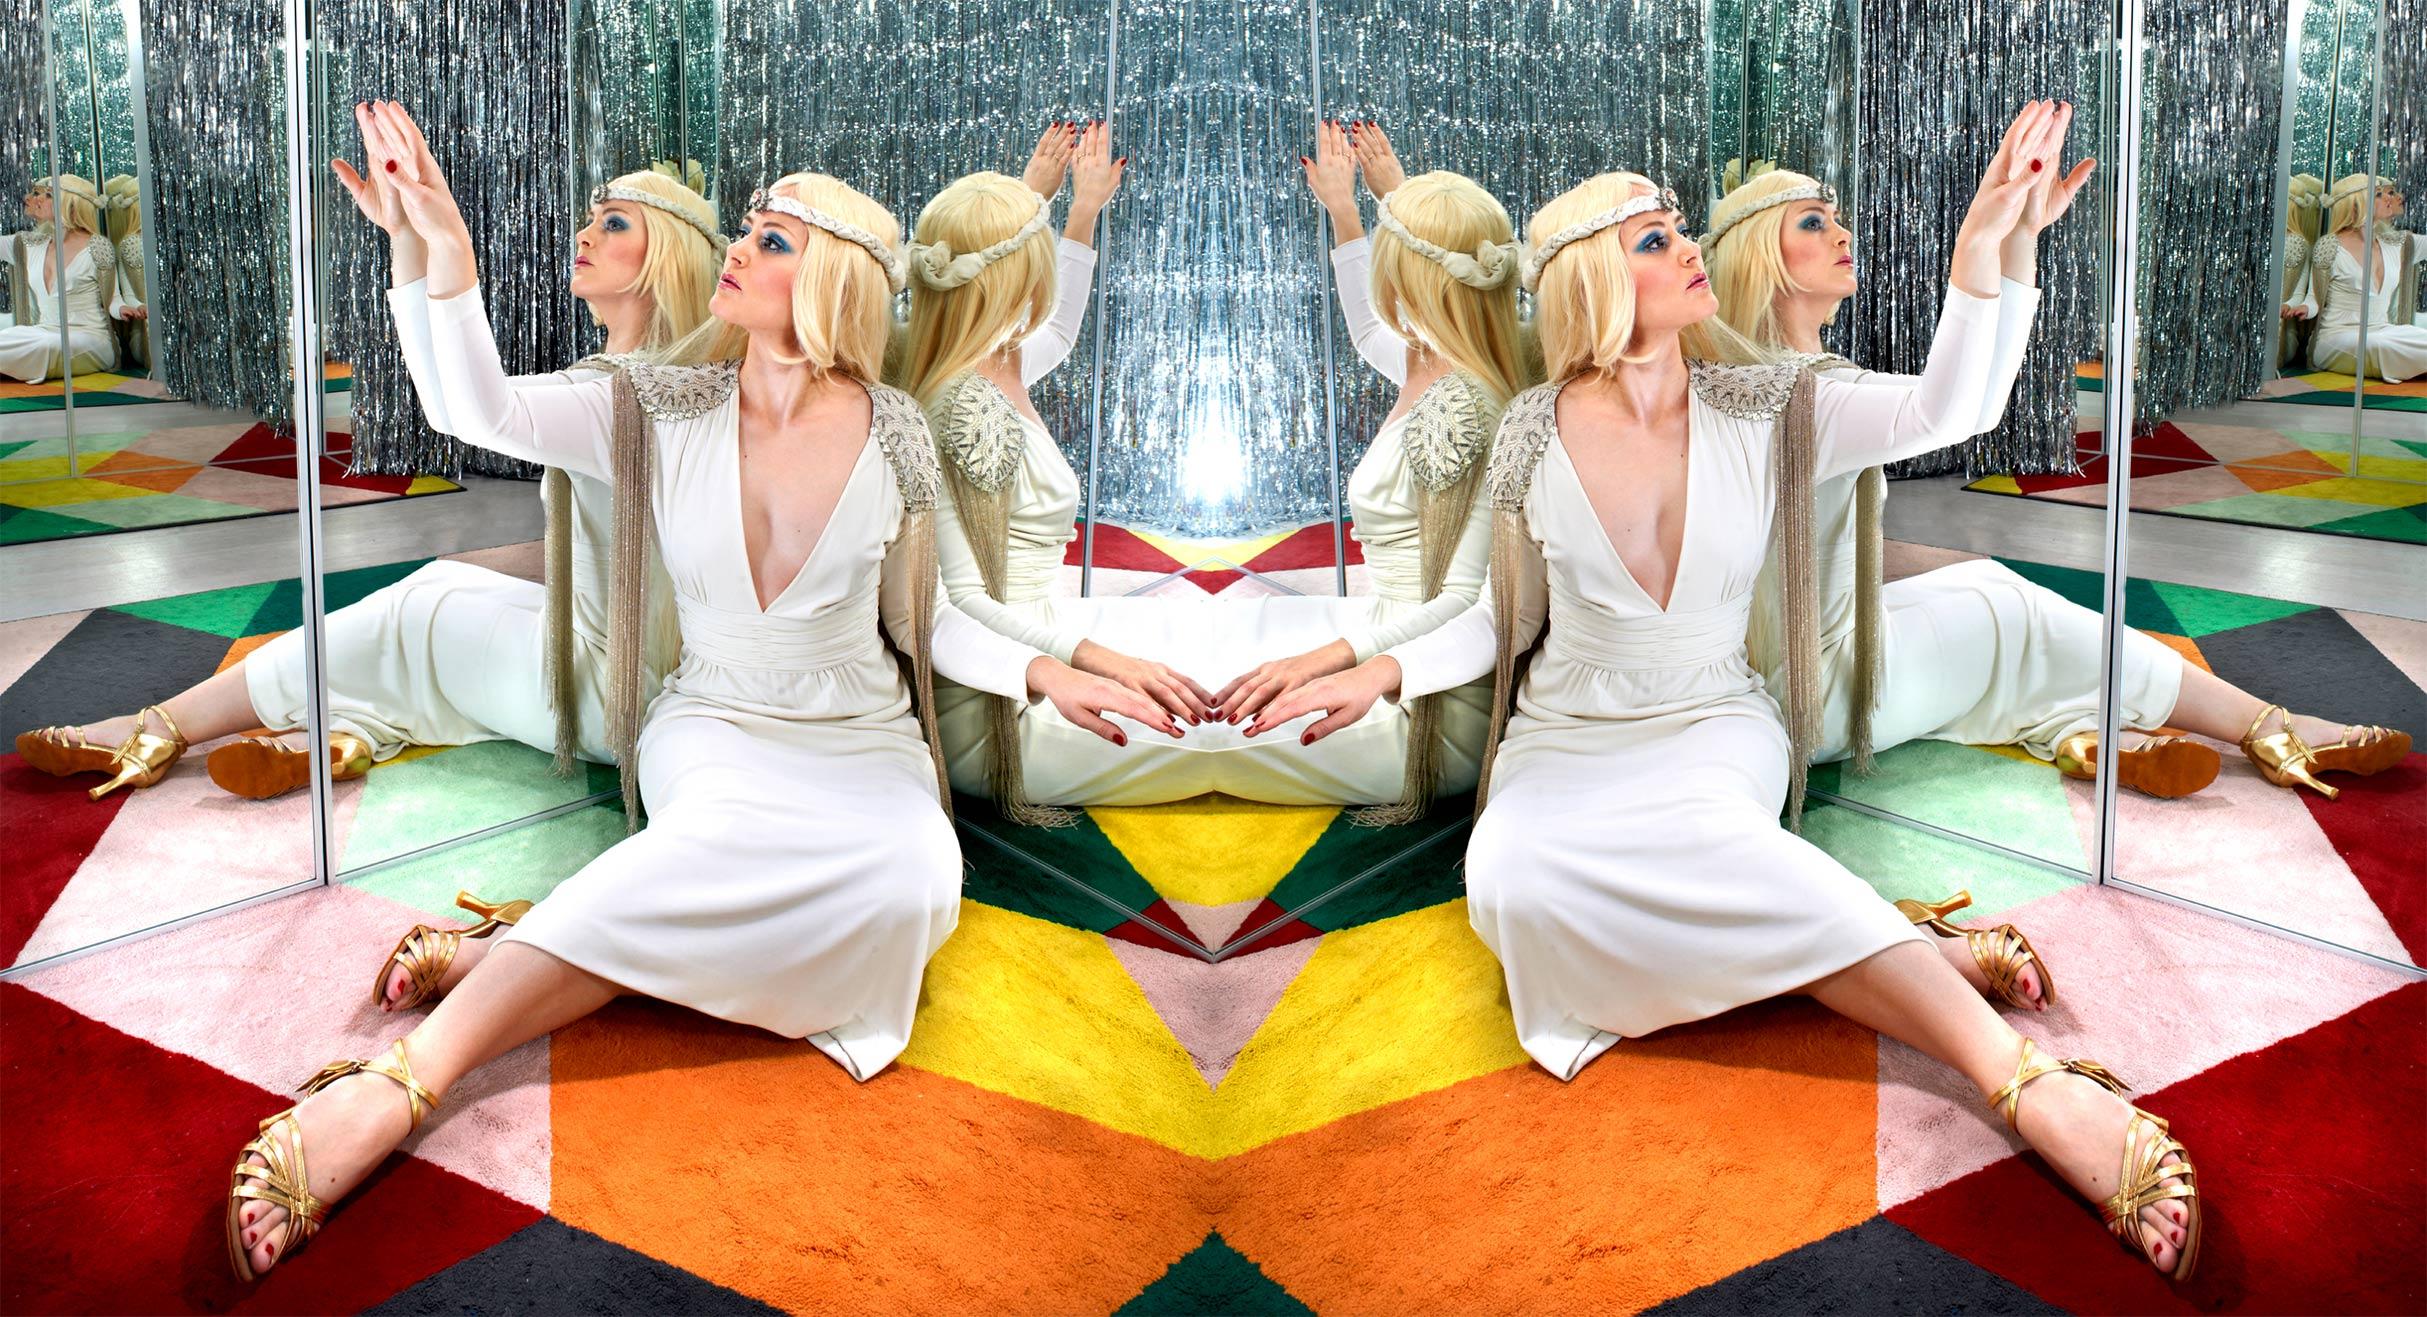 "Vintage butik FN92 afholder vintage mode show ""The ABBA Show"""